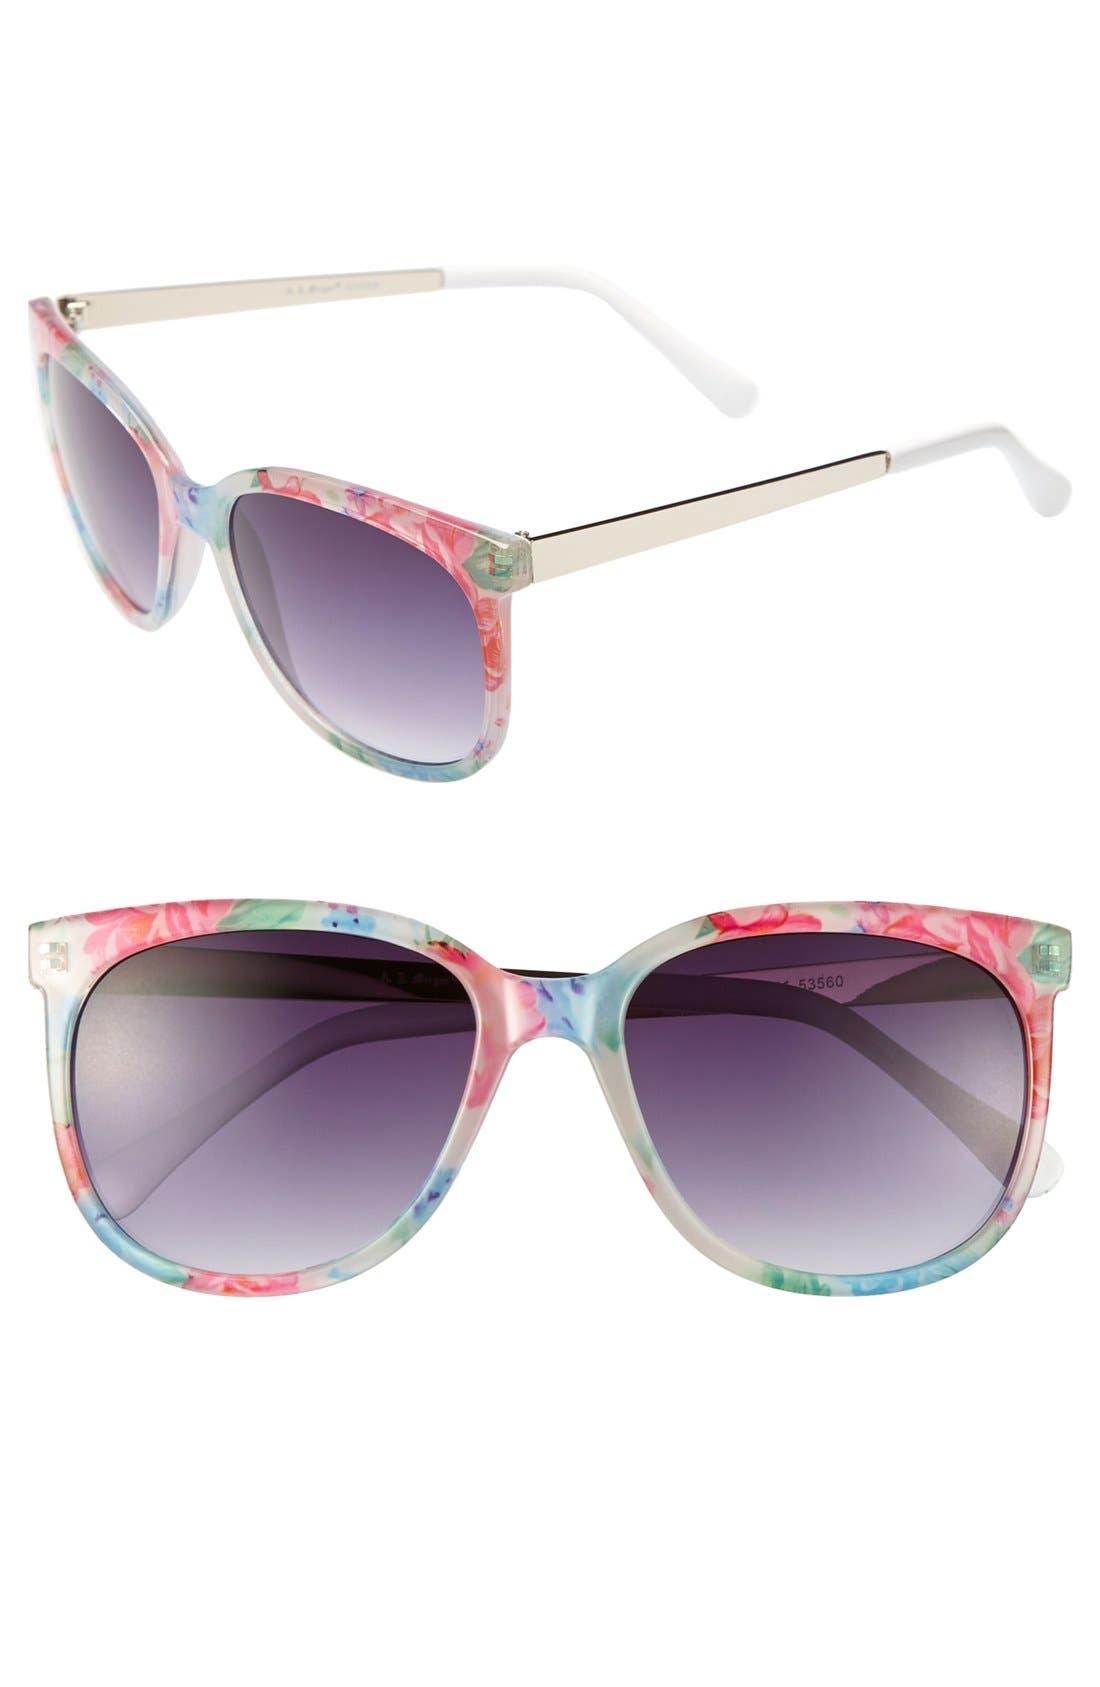 Alternate Image 1 Selected - A.J. Morgan 'Mirage' Sunglasses